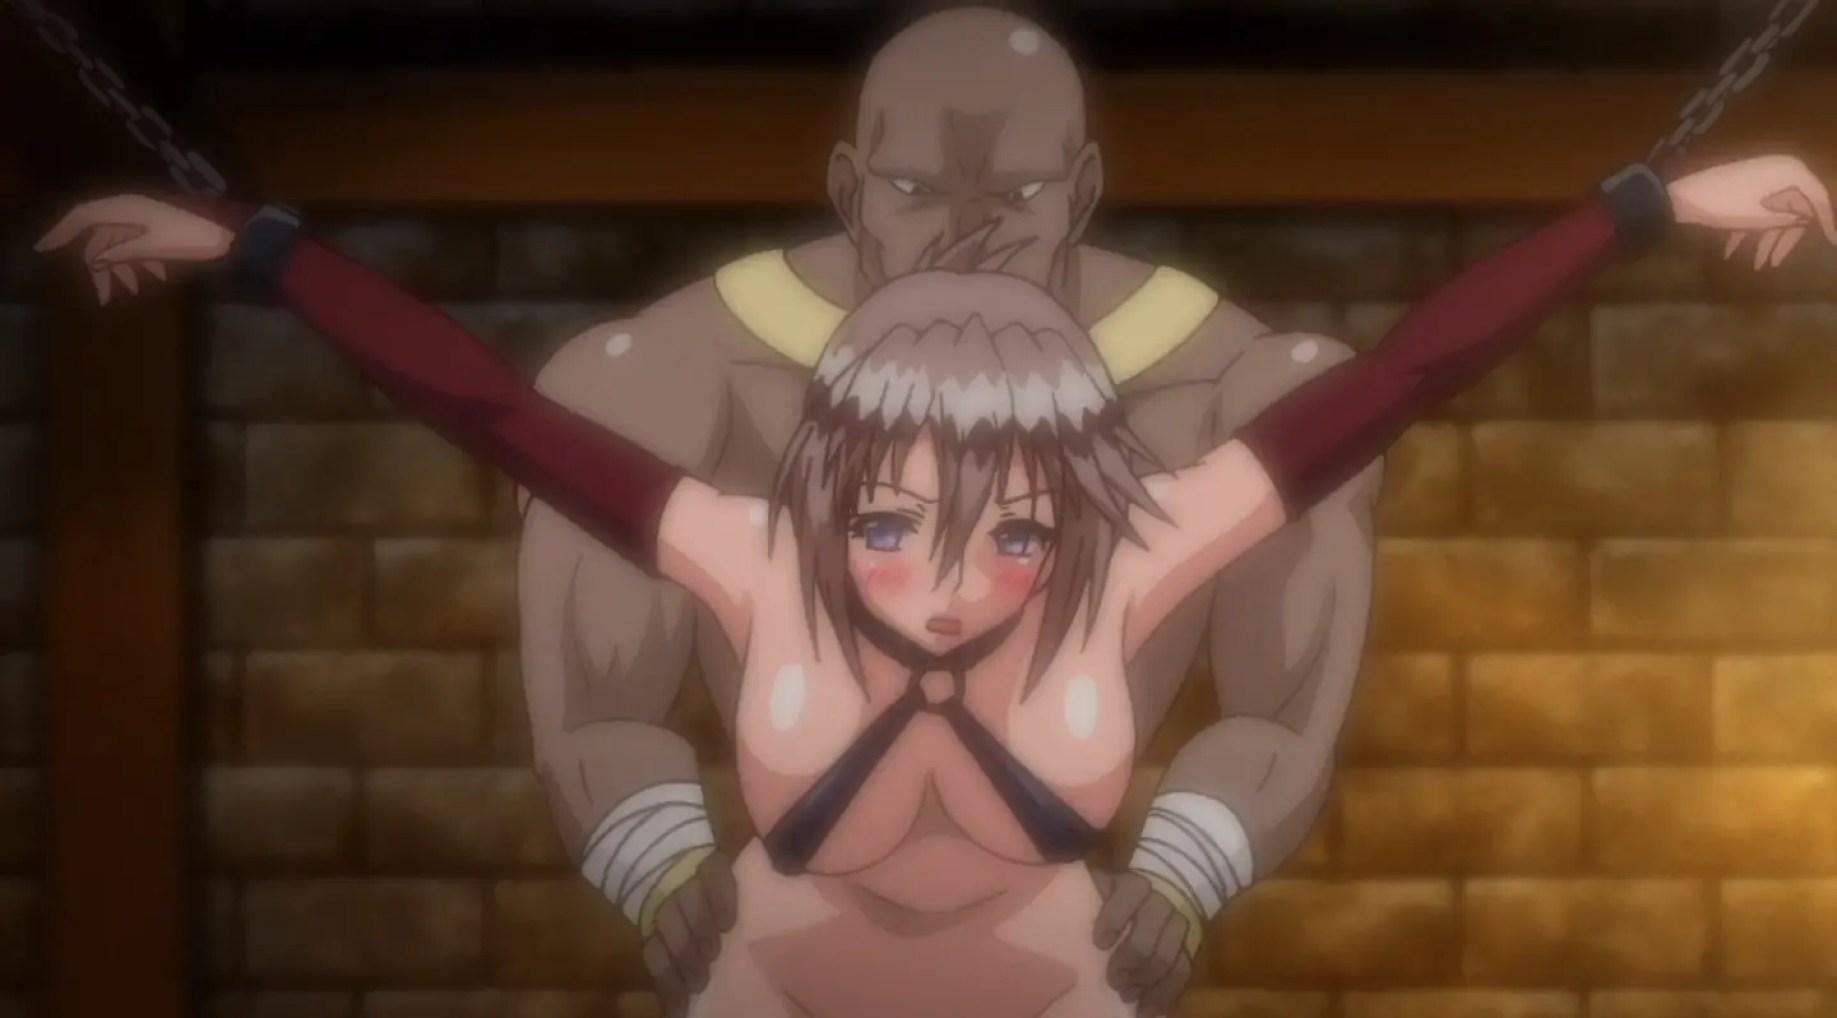 Anime girl loses virginity